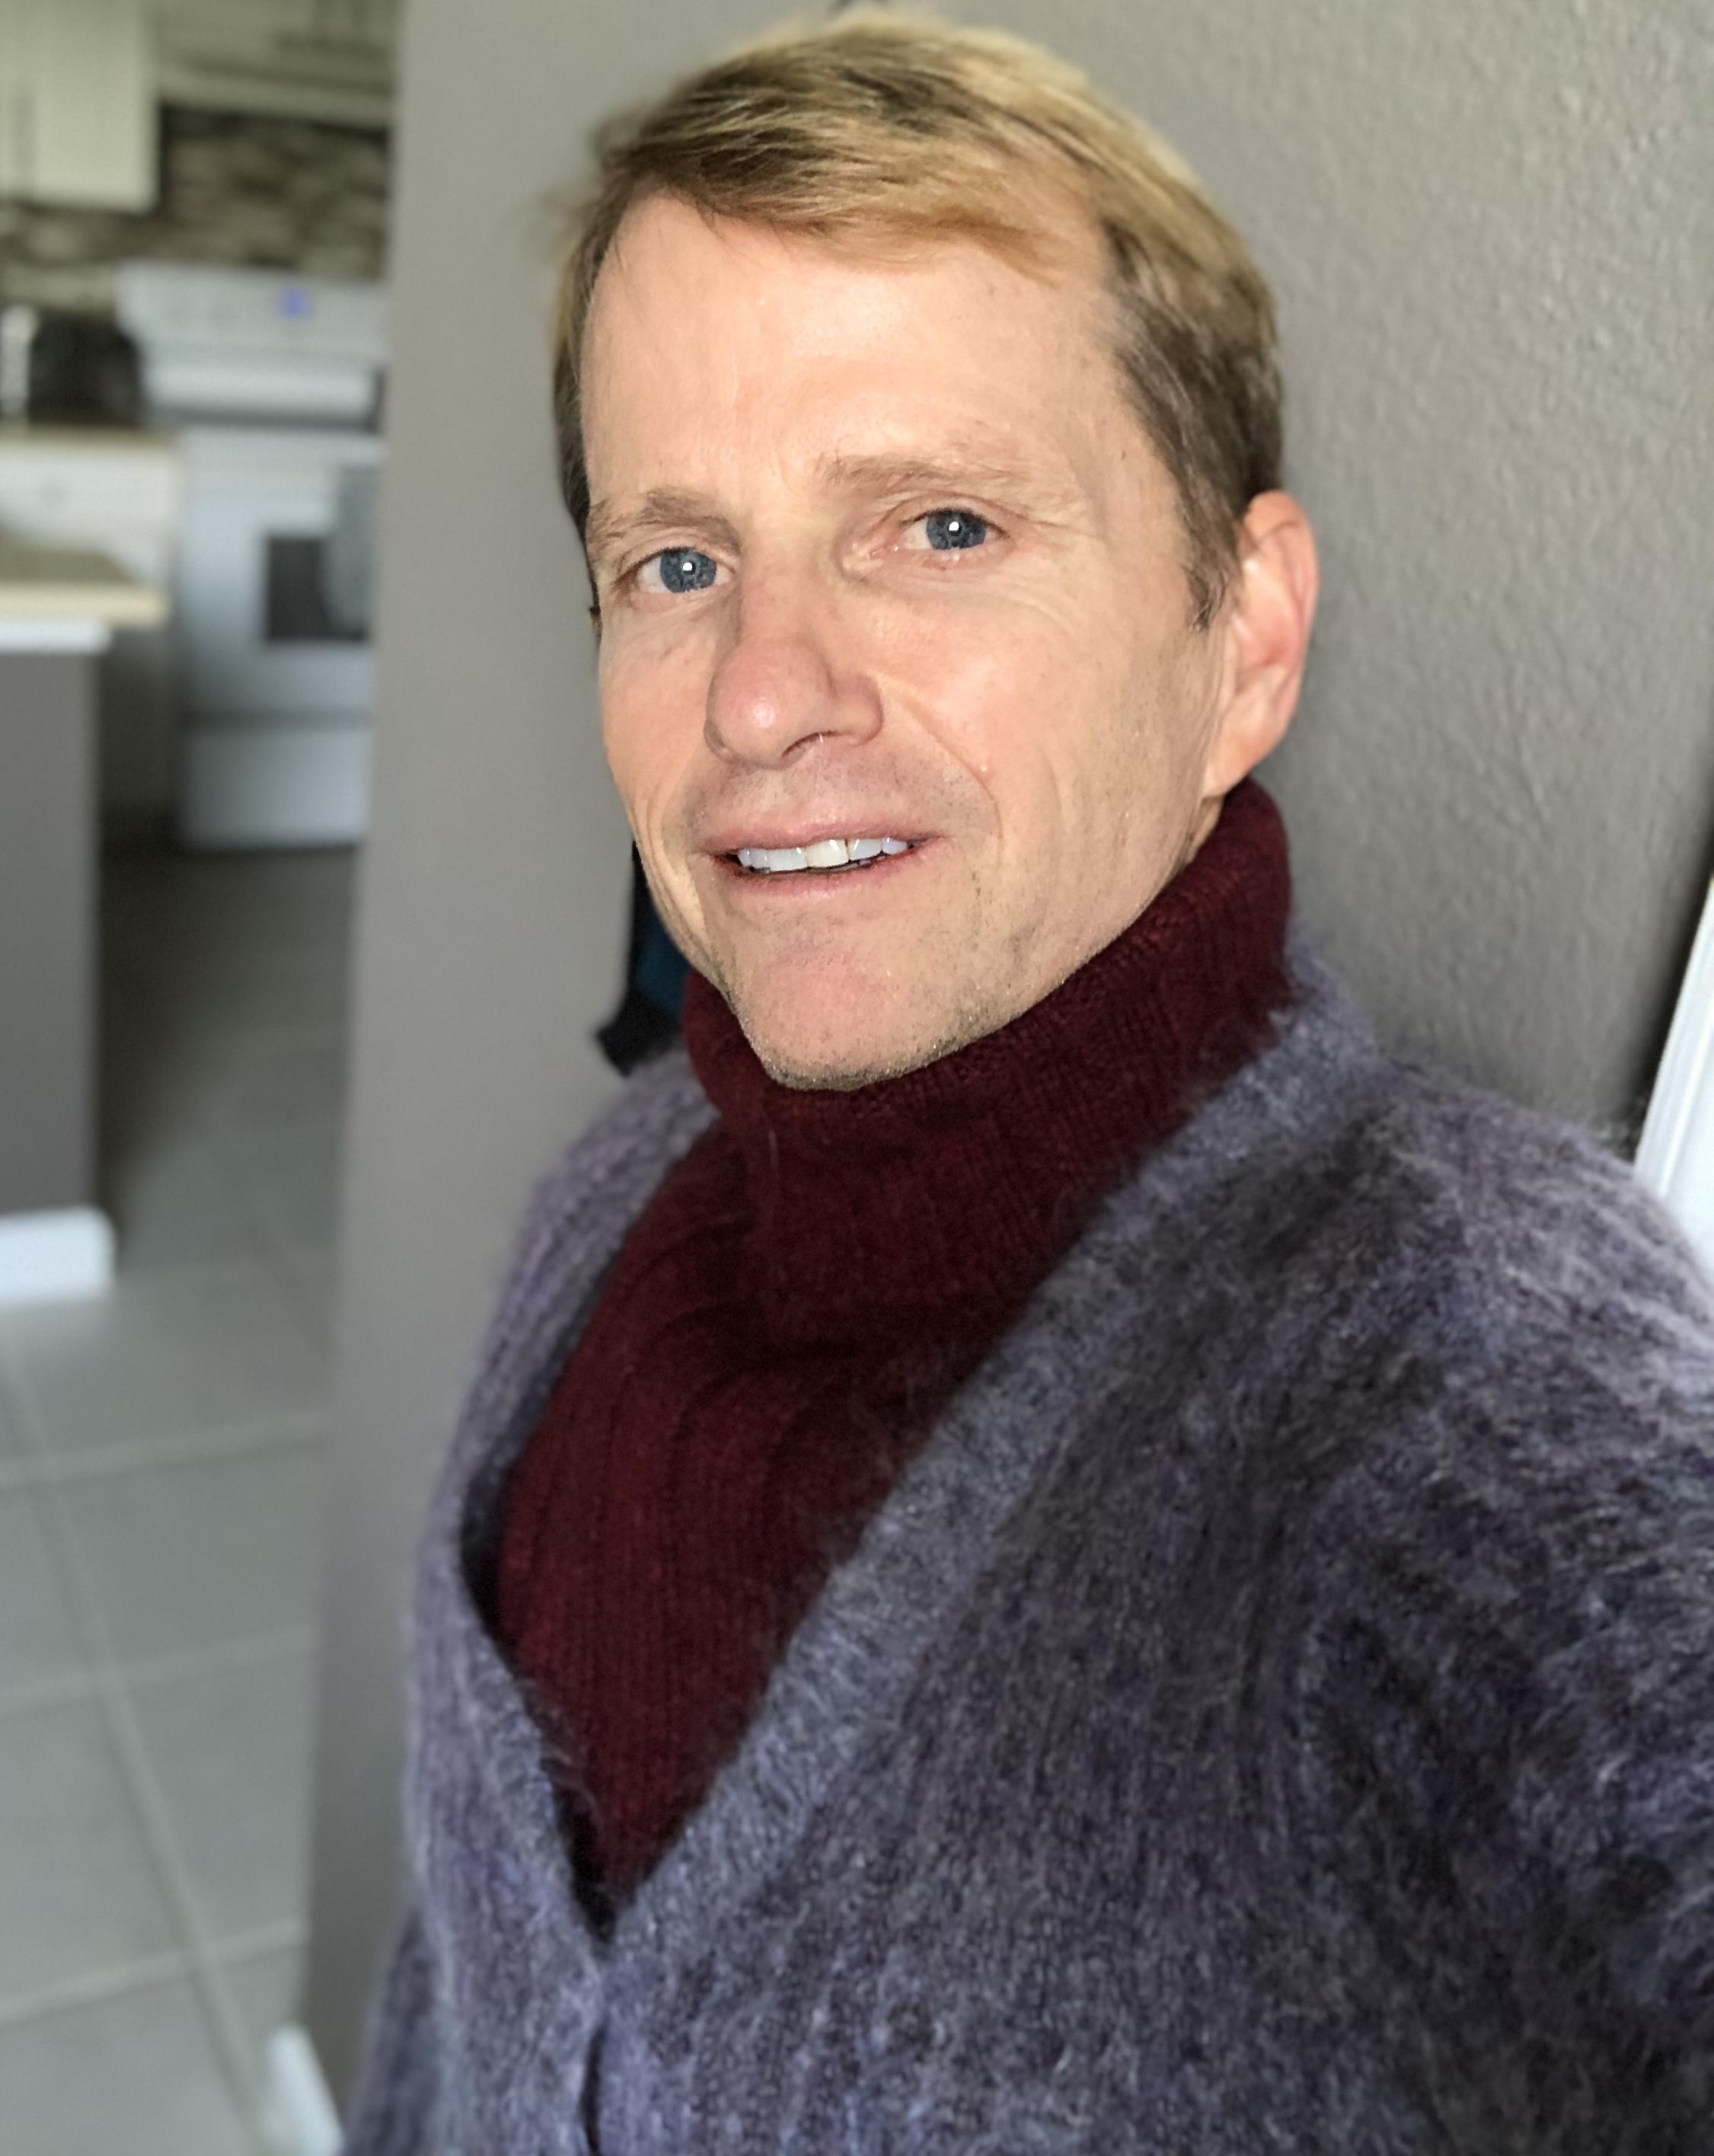 Gay wool fetish